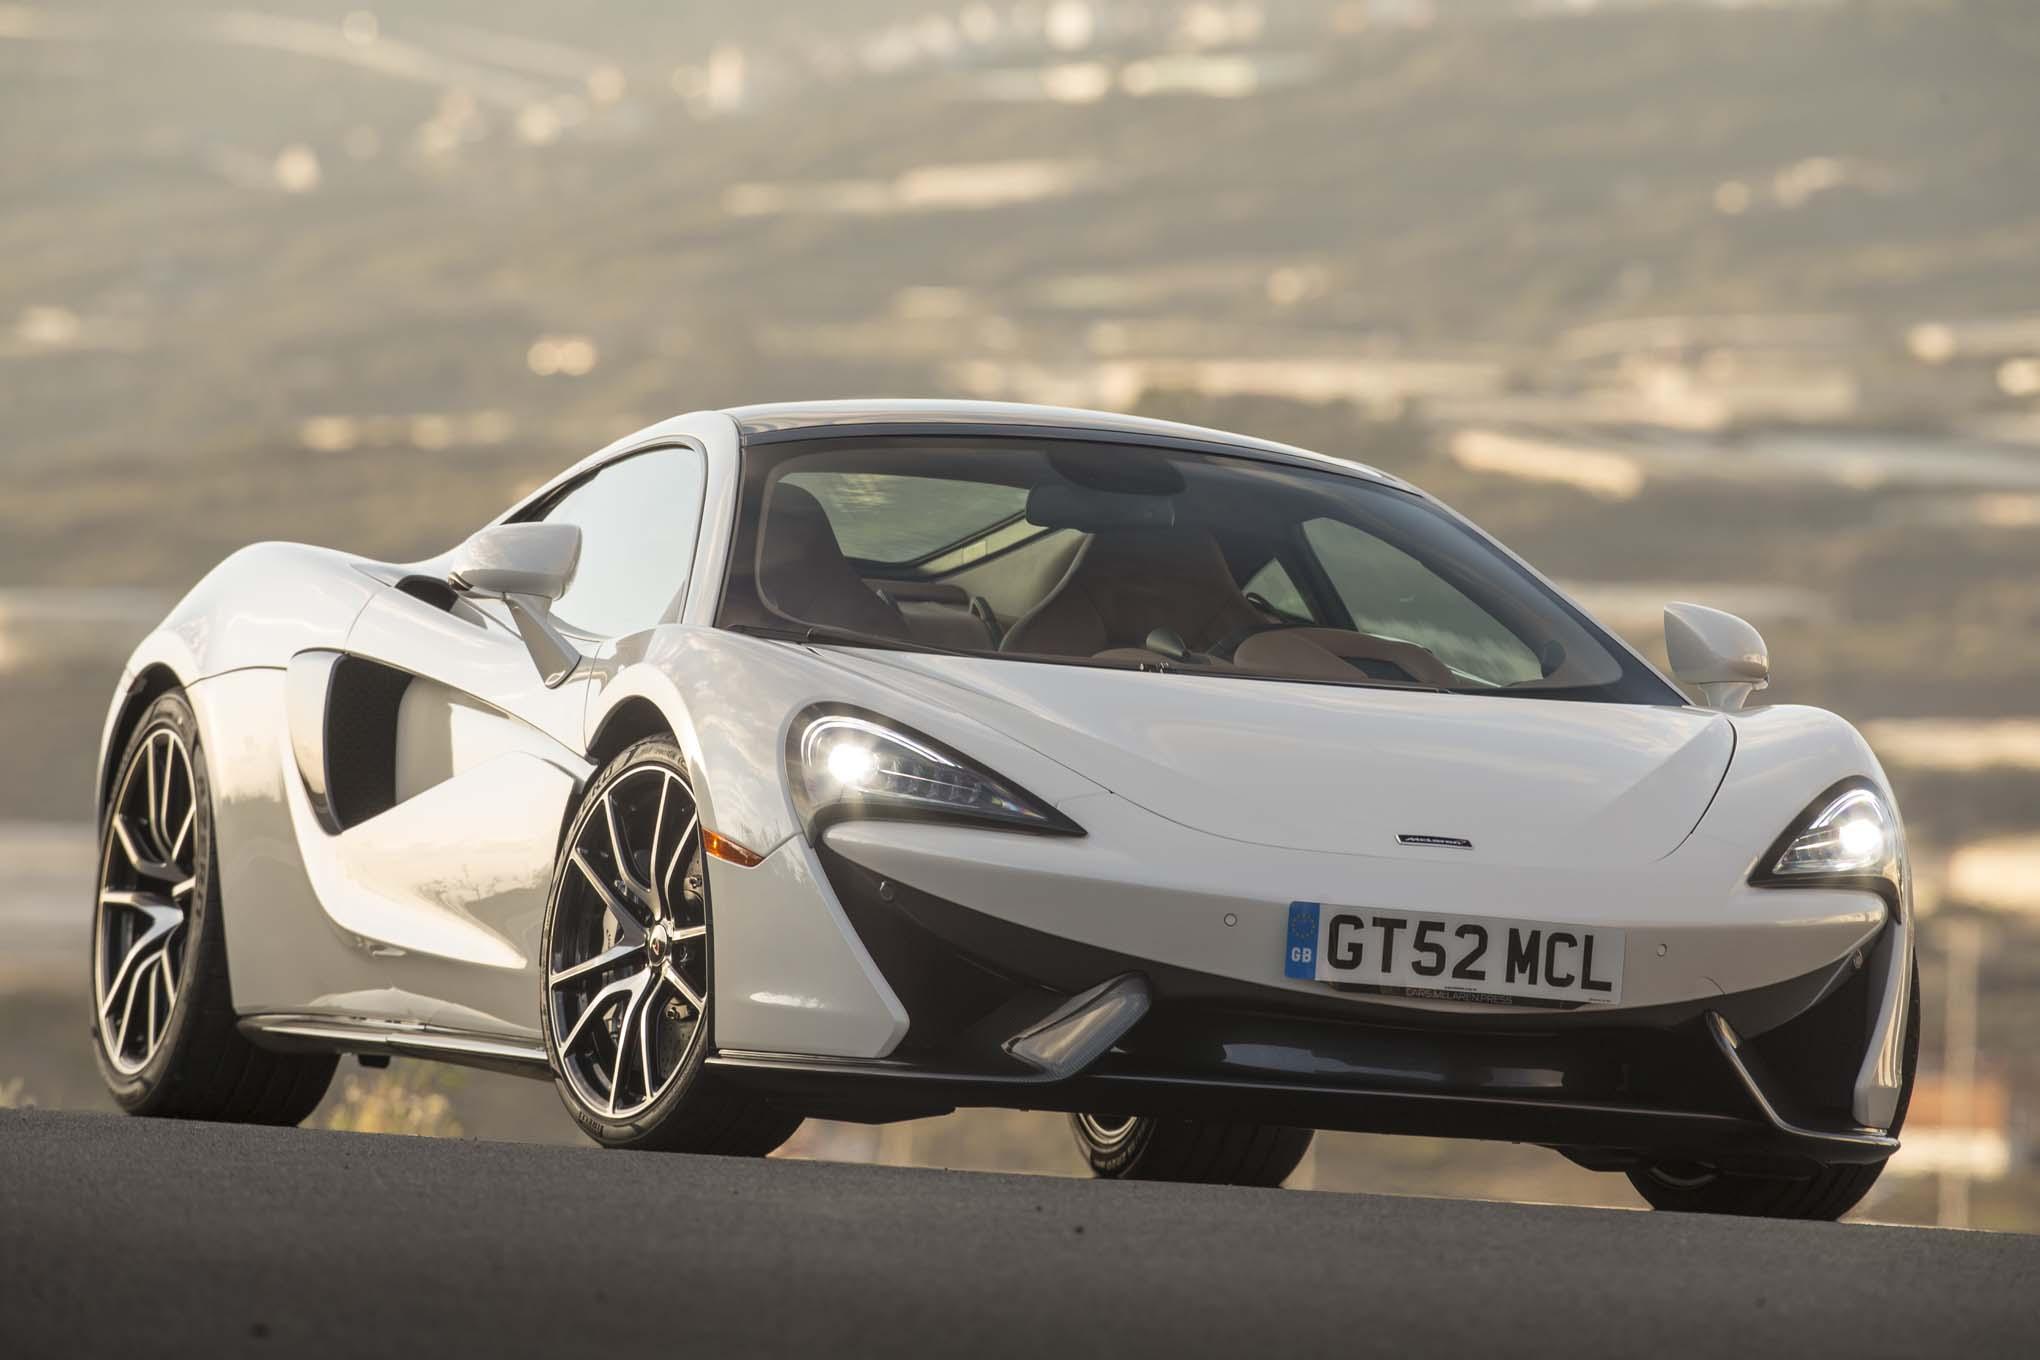 https://st.automobilemag.com/uploads/sites/11/2016/05/2017-McLaren-570GT-front-three-quarter-headlight.jpg